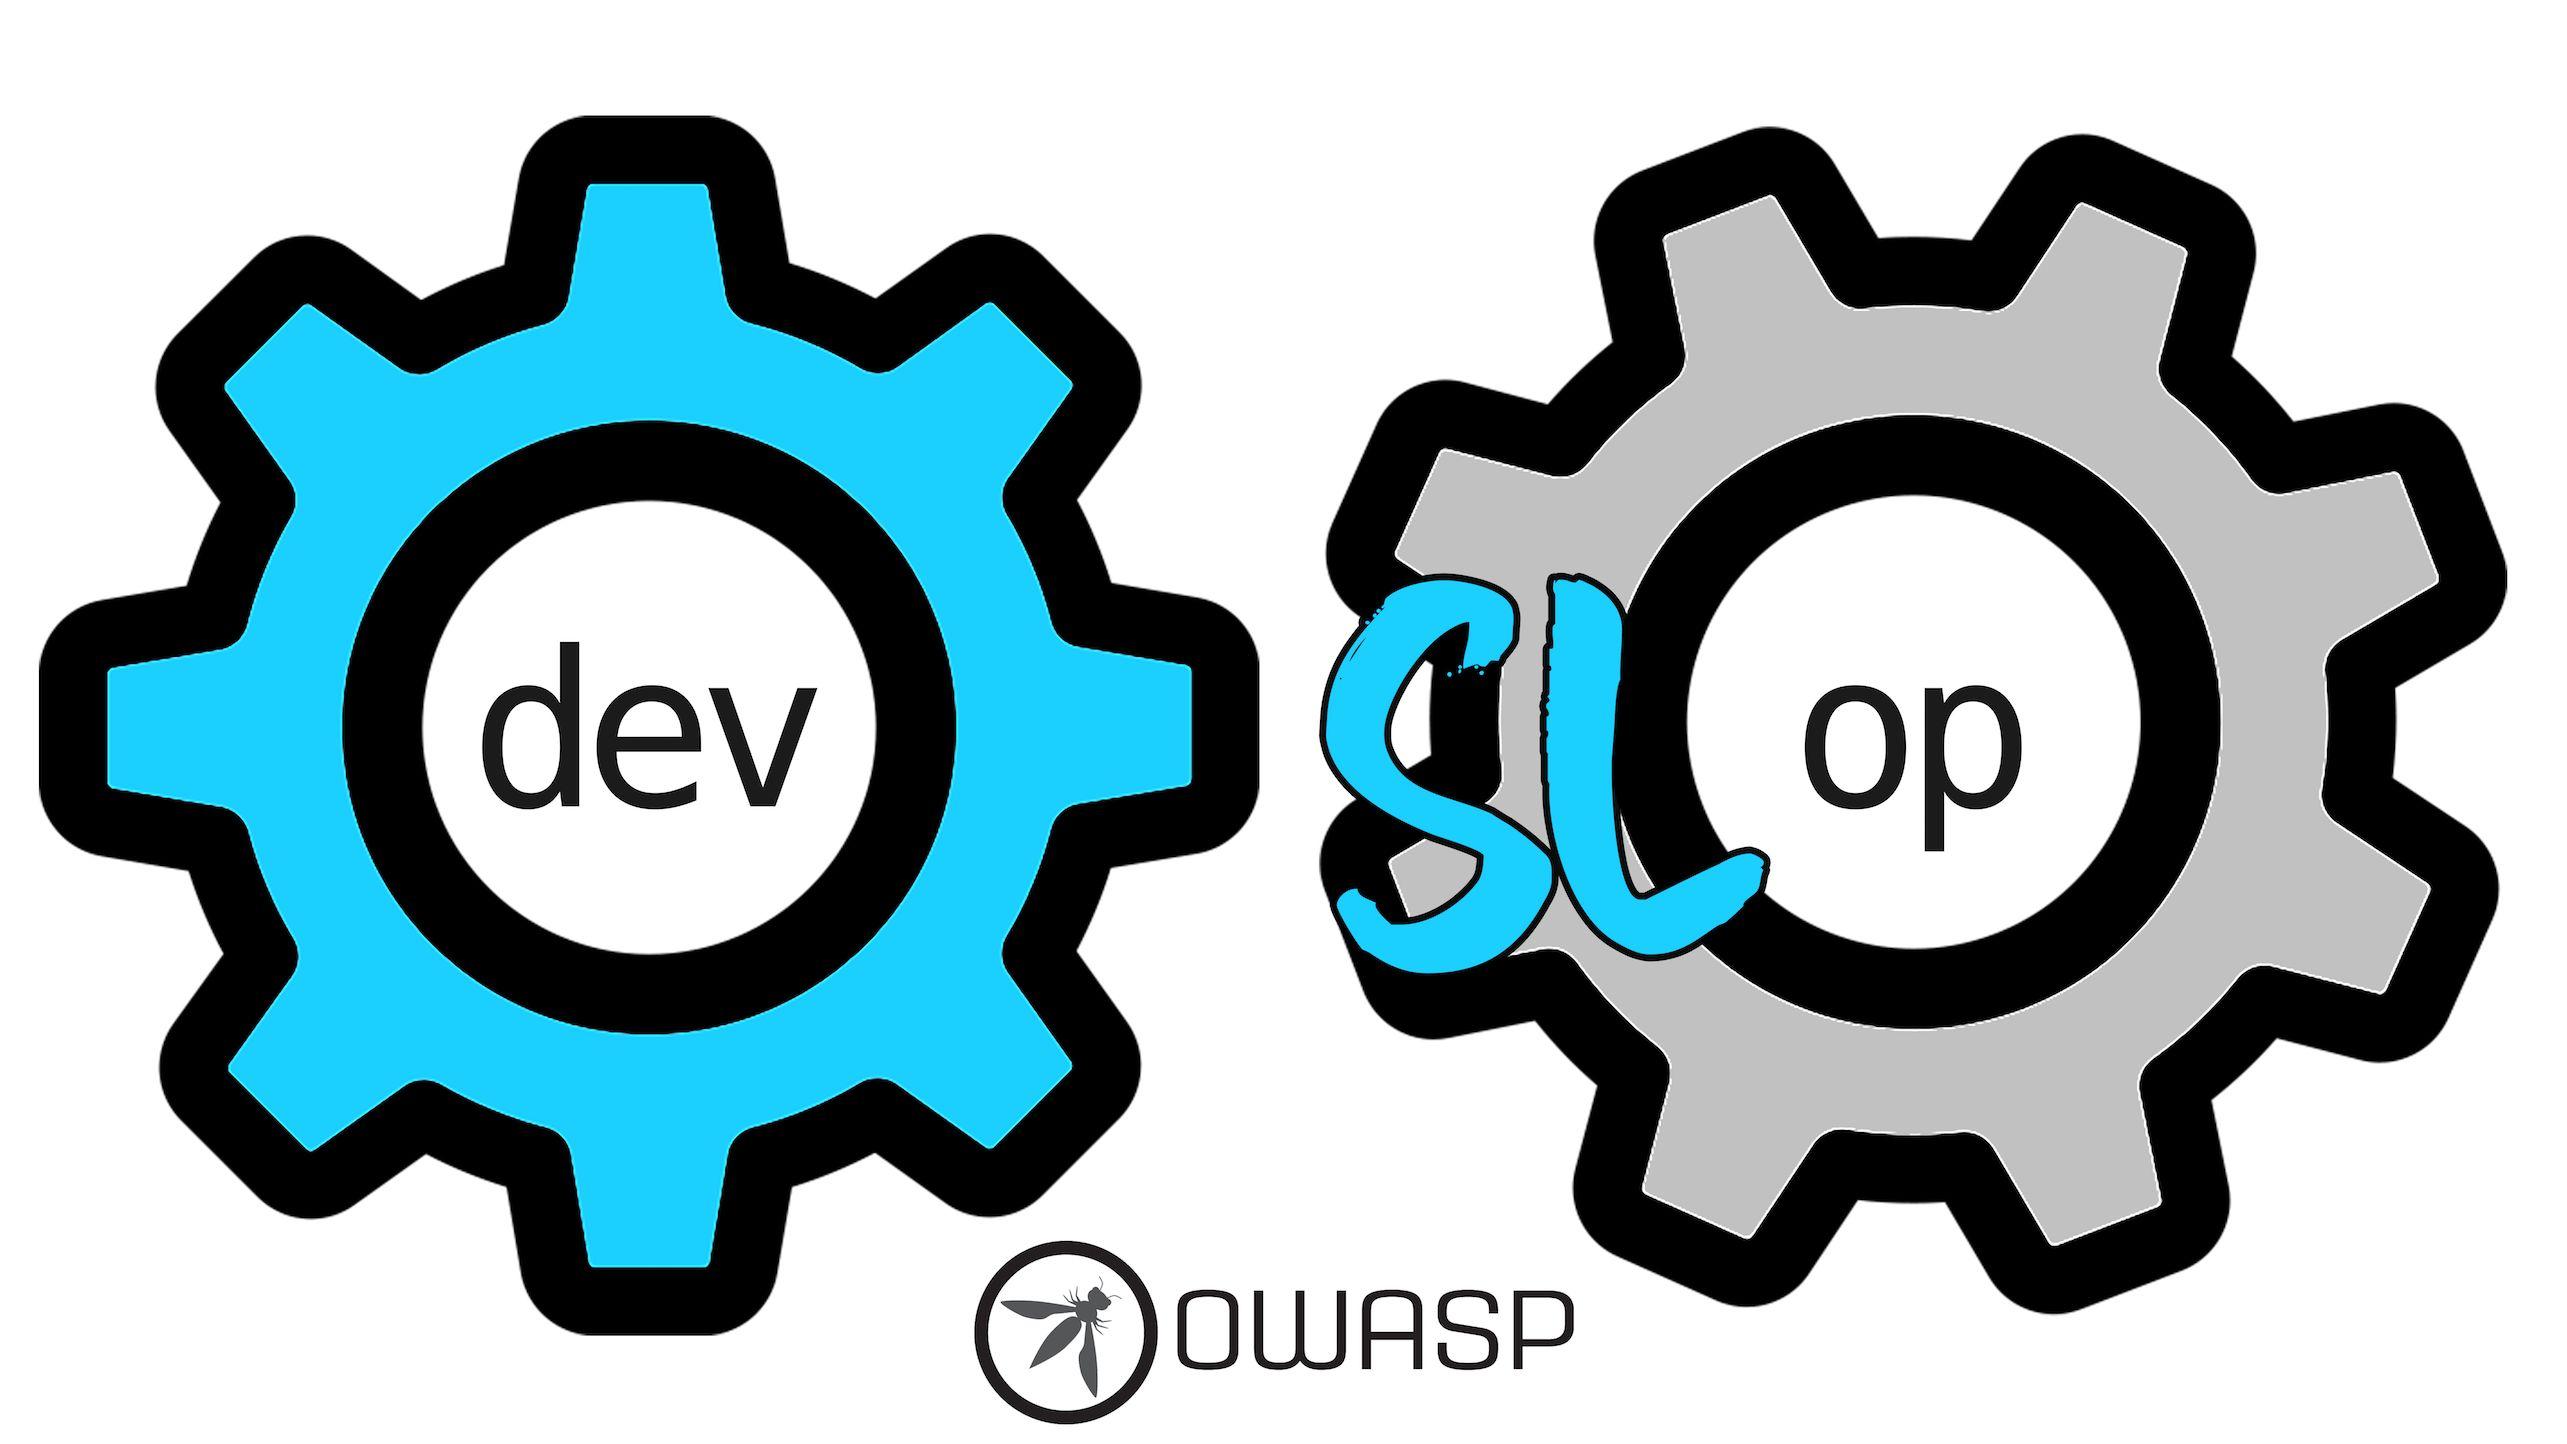 OWASP DevSlop Project